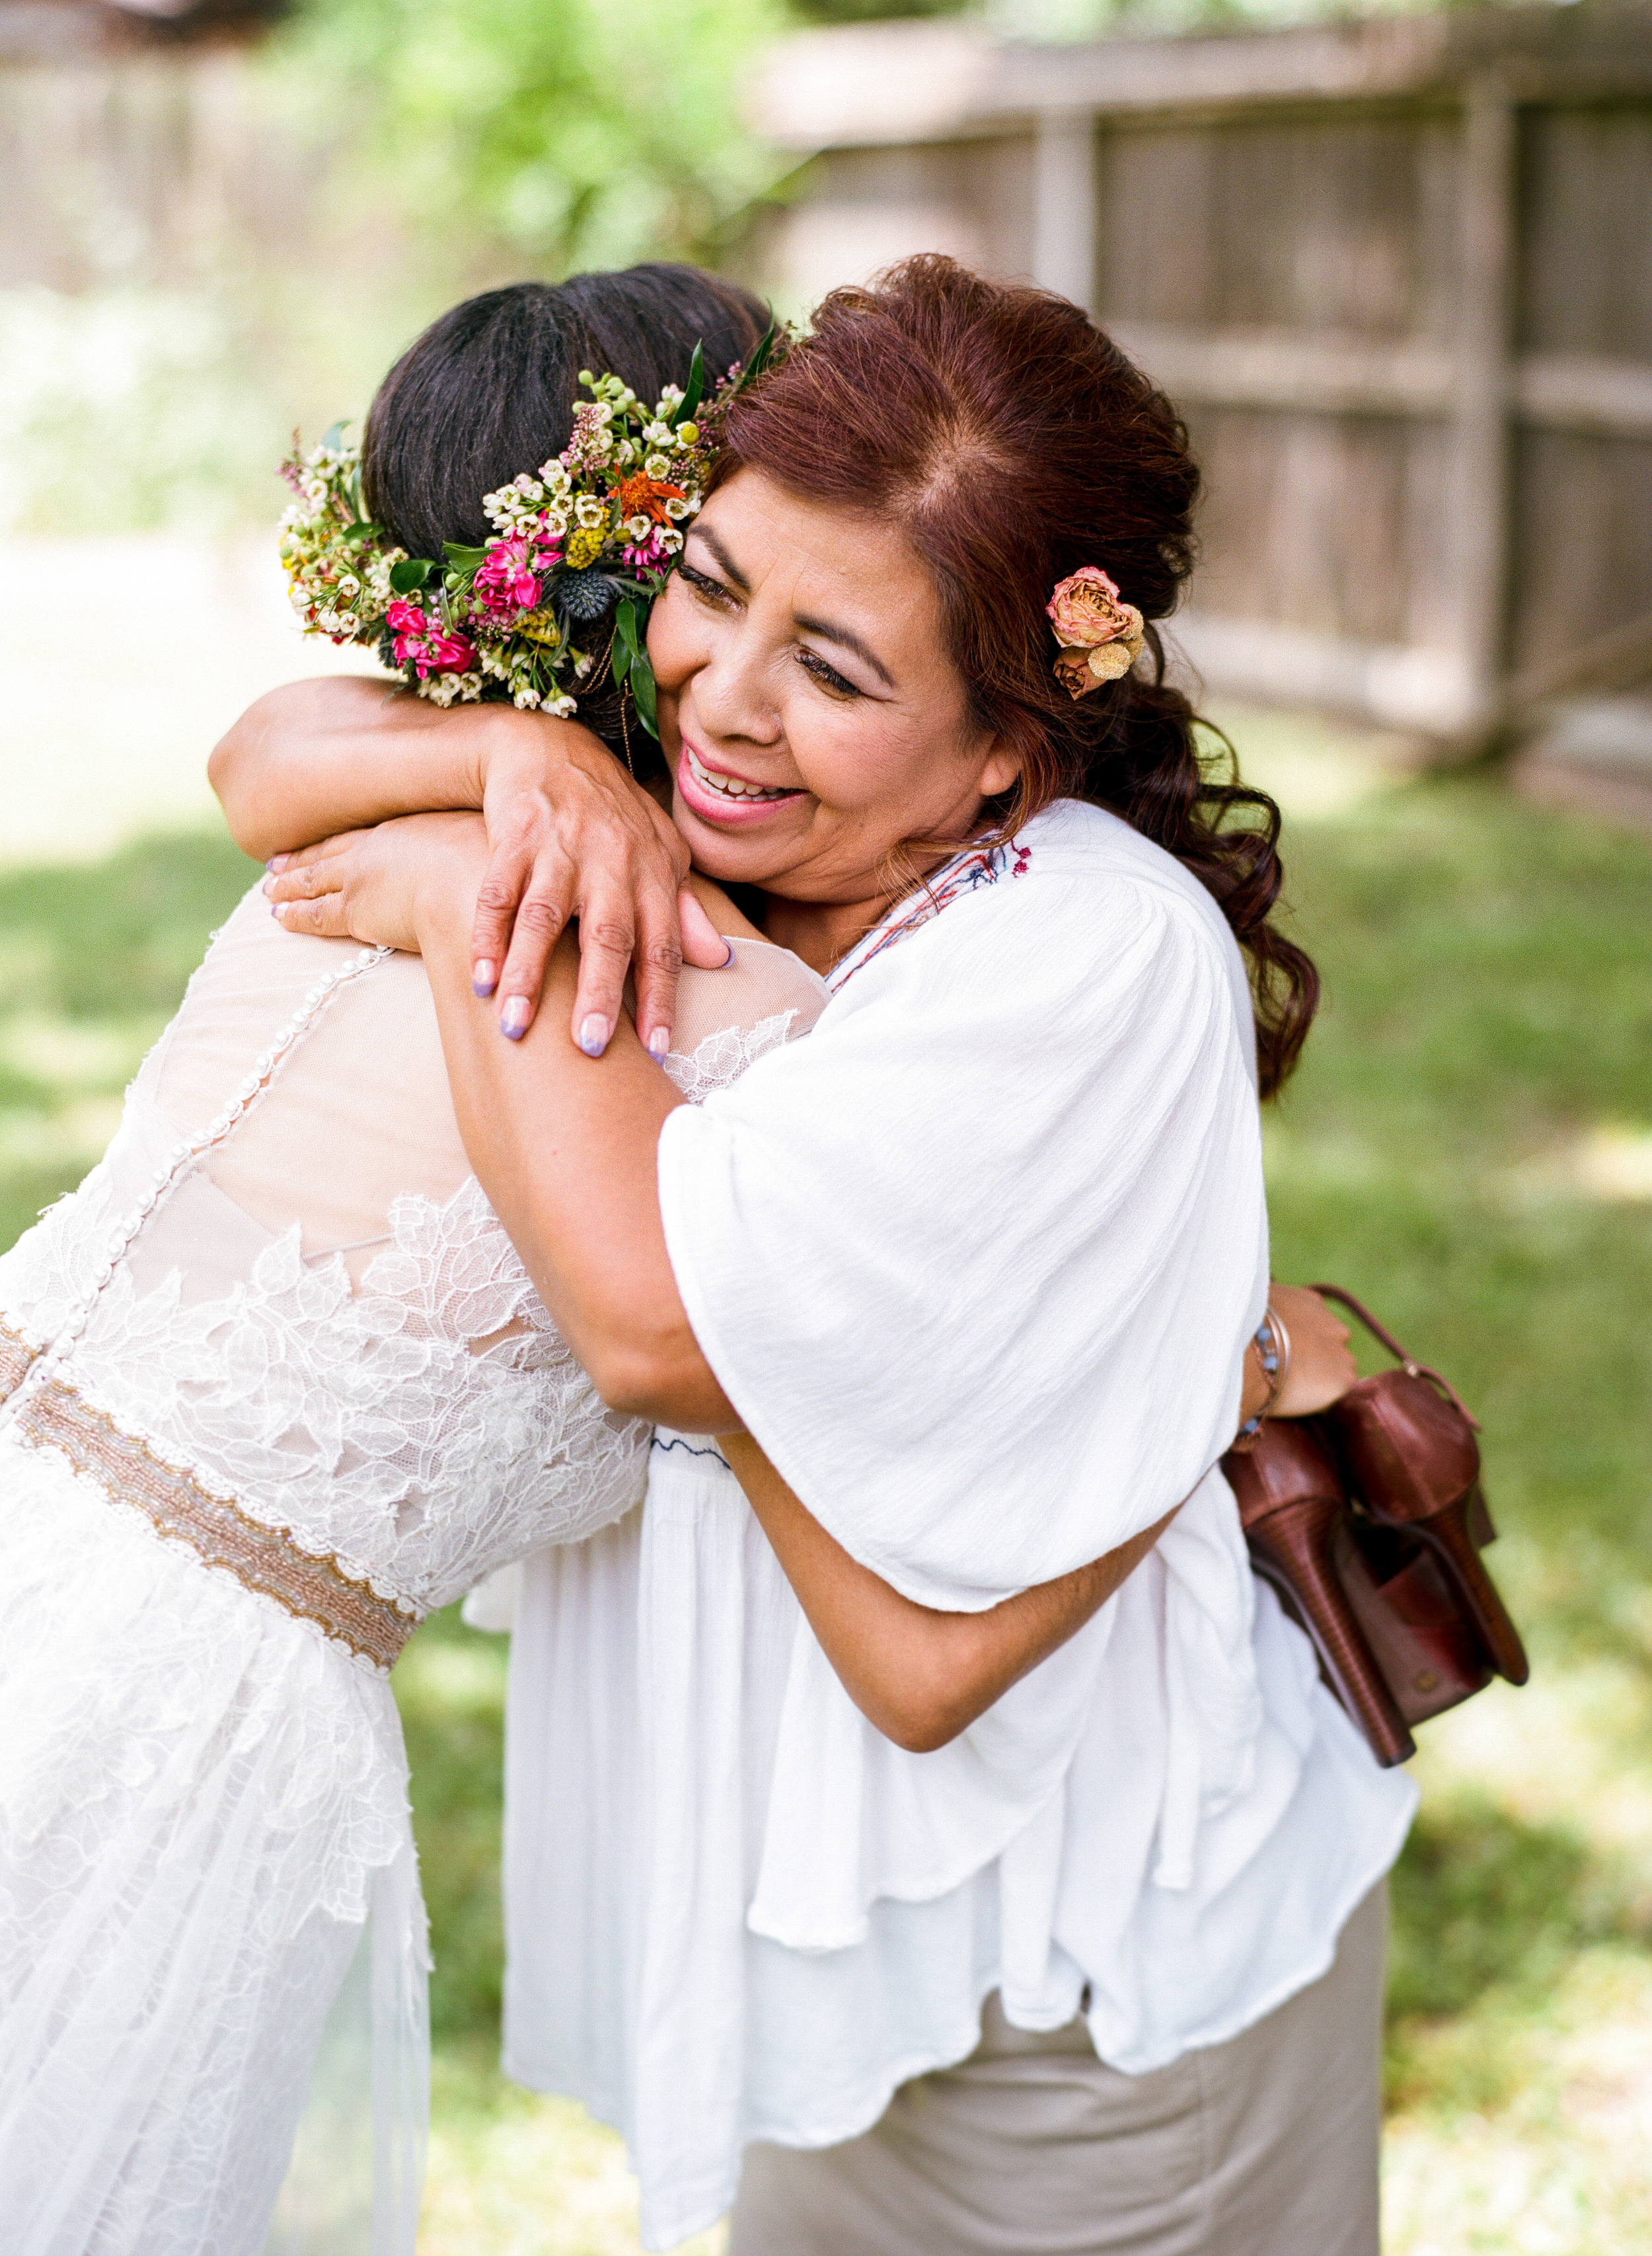 Dana-Fernandez-Photography-Martha-Stewart-Weddings-Houston-Texas-Wedding-Photographer-Film-49.jpg